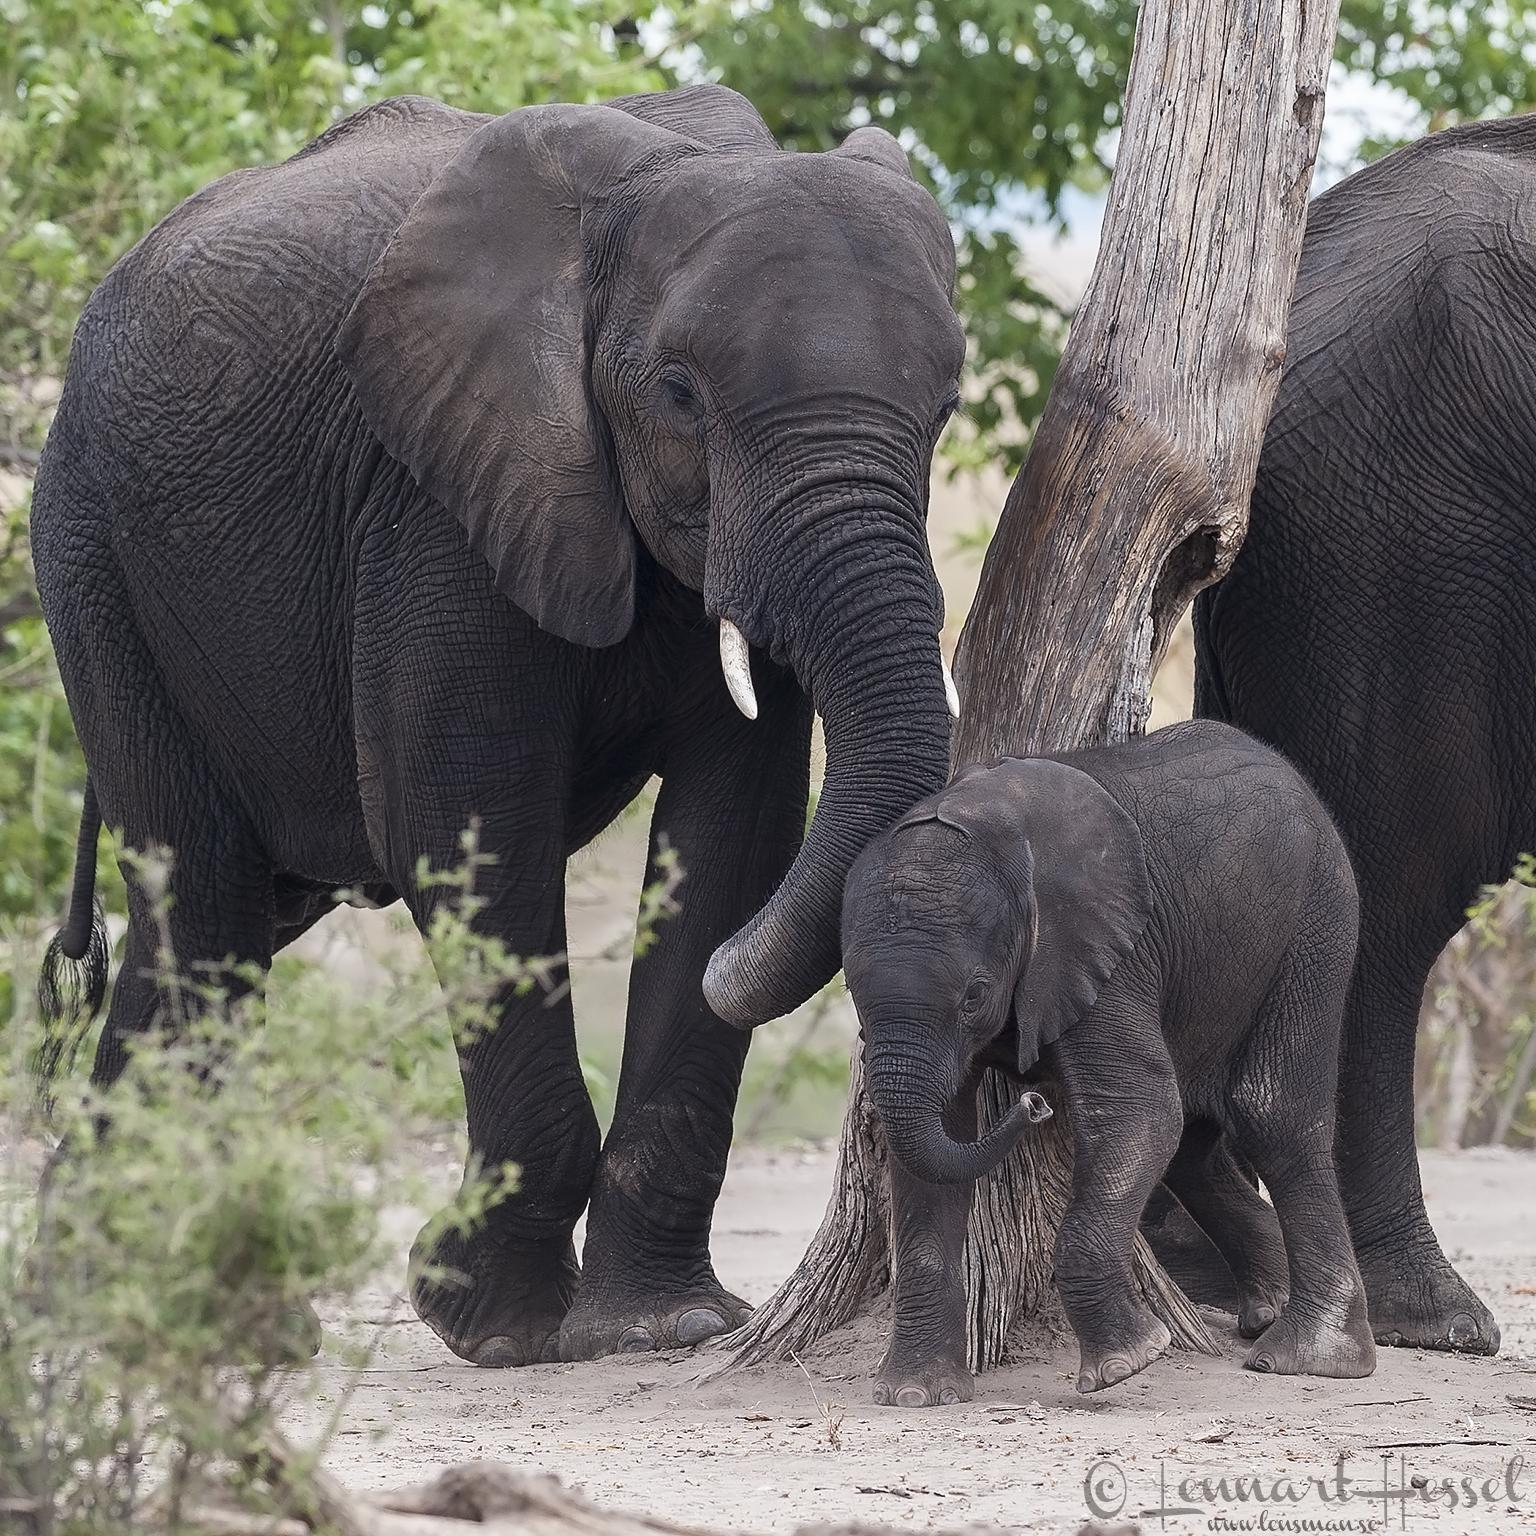 Elephants scratching in Chobe River area, Botswana